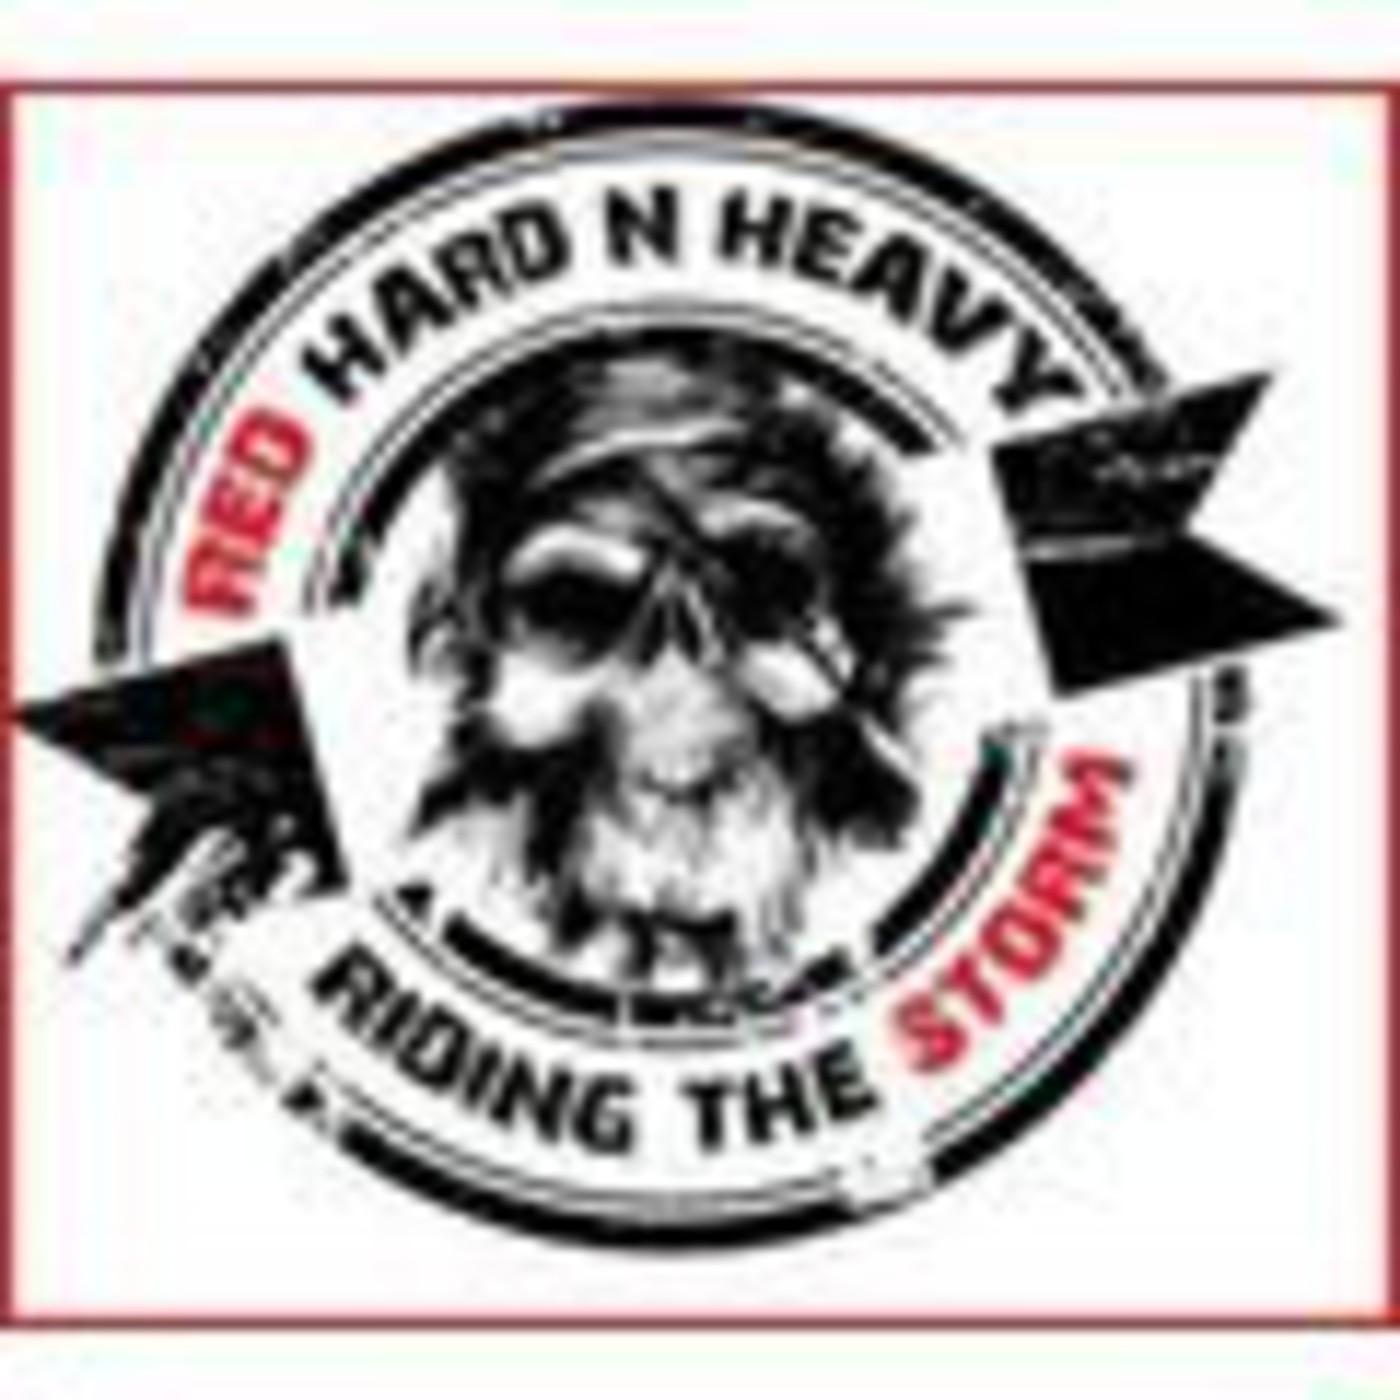 Redhardnheavy.com